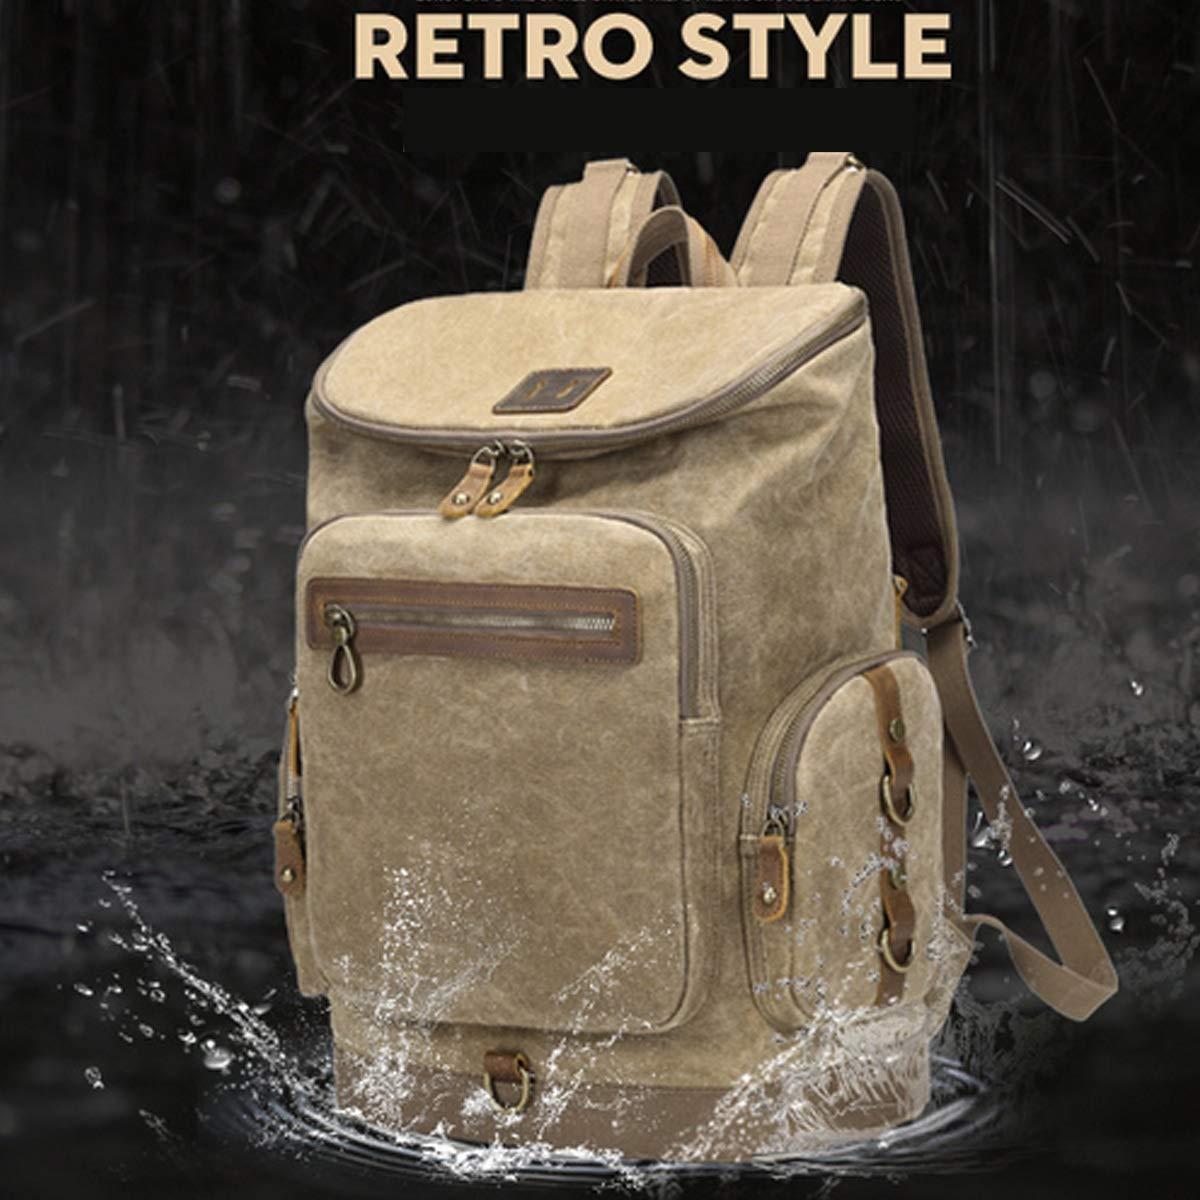 Travel Essential Waterproof Handbag Brown 16 Inches Xionghaizi Duffel Bag,Canvas Backpack Color : Khaki Portable